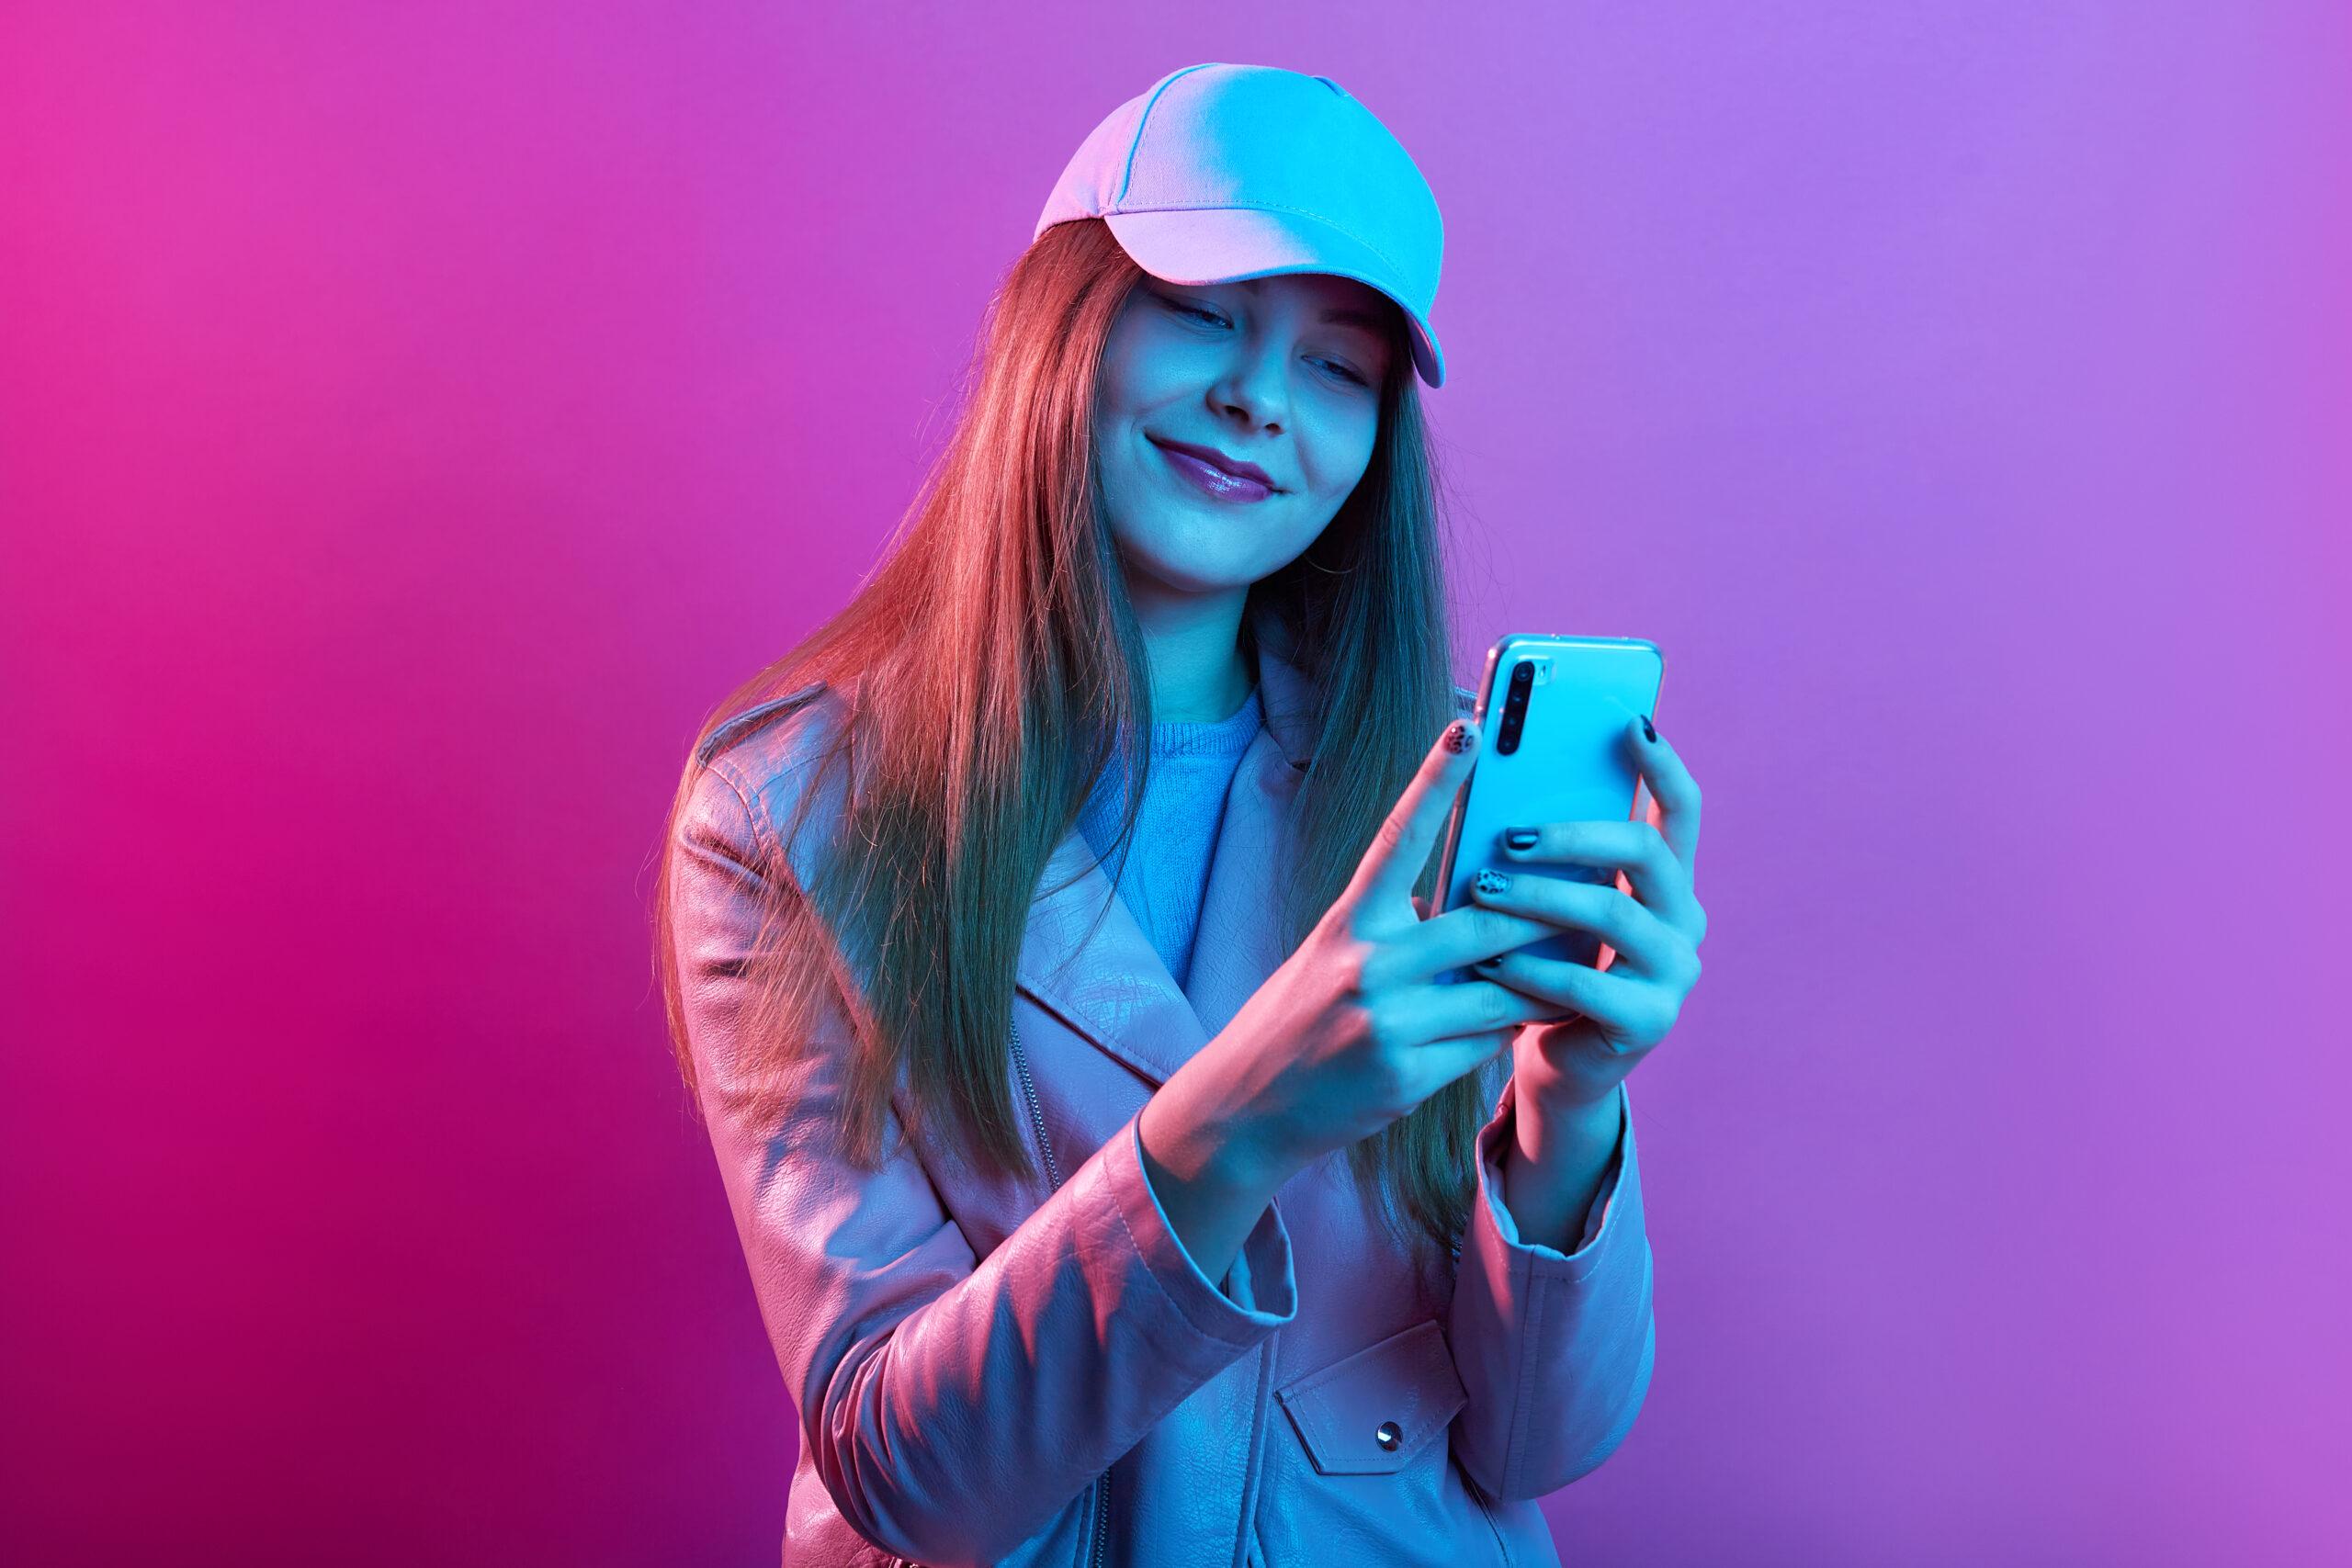 tendencias móviles